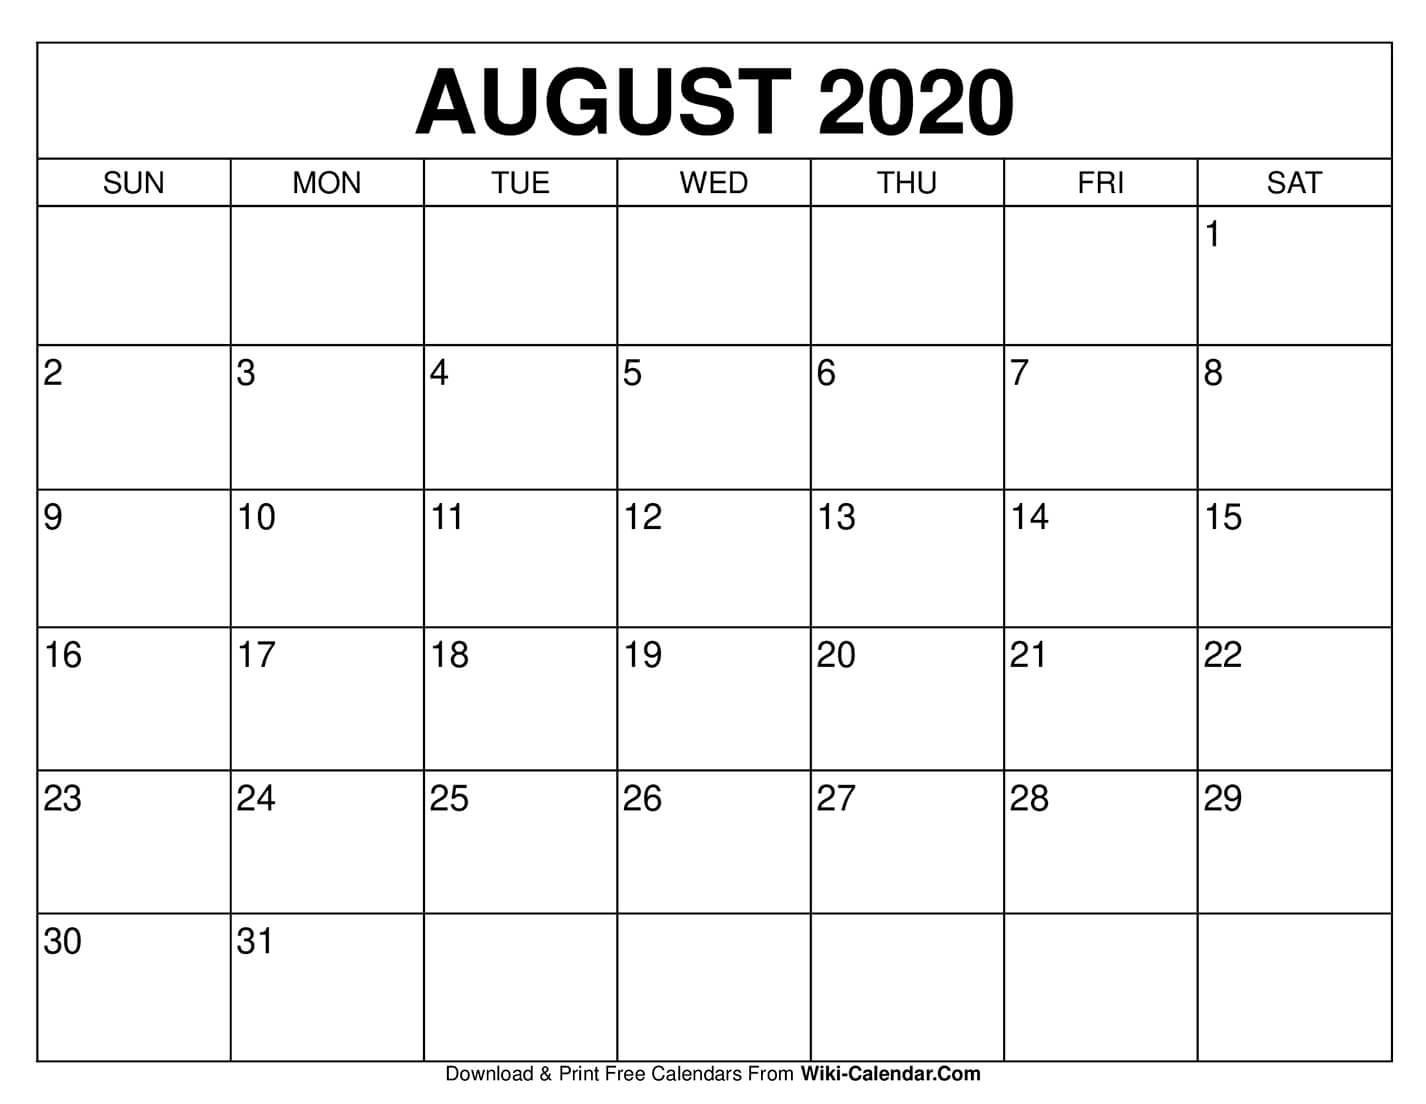 Free Printable August 2020 Calendars  August 2020 Calendar